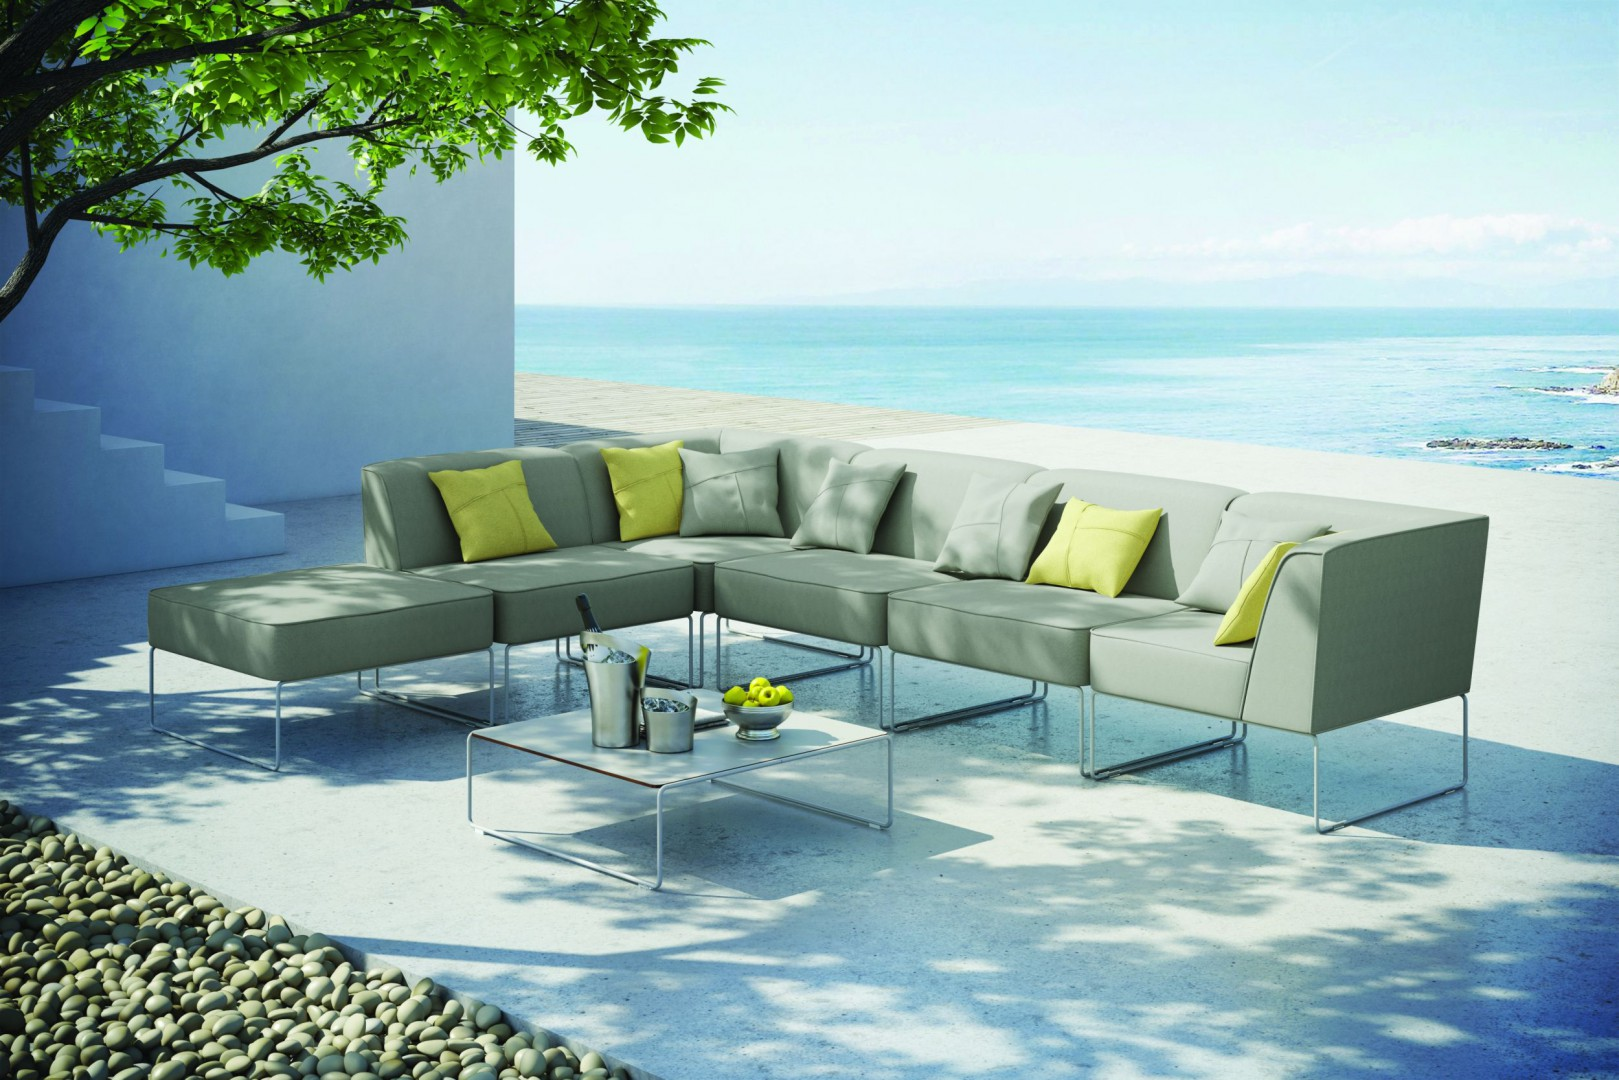 Sofa outdoorowa z kolekcji Dias firmy Miloo Home. Fot. Miloo Home